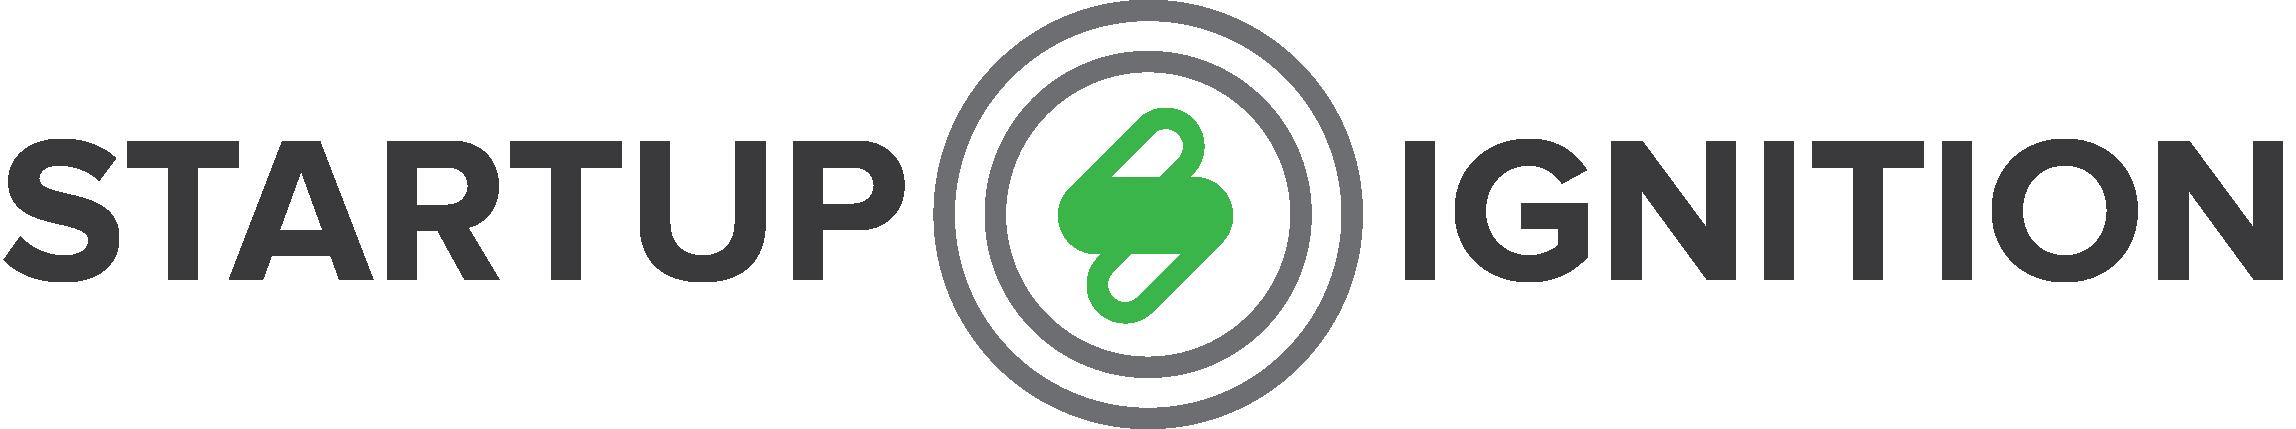 Startup Ignition Logo